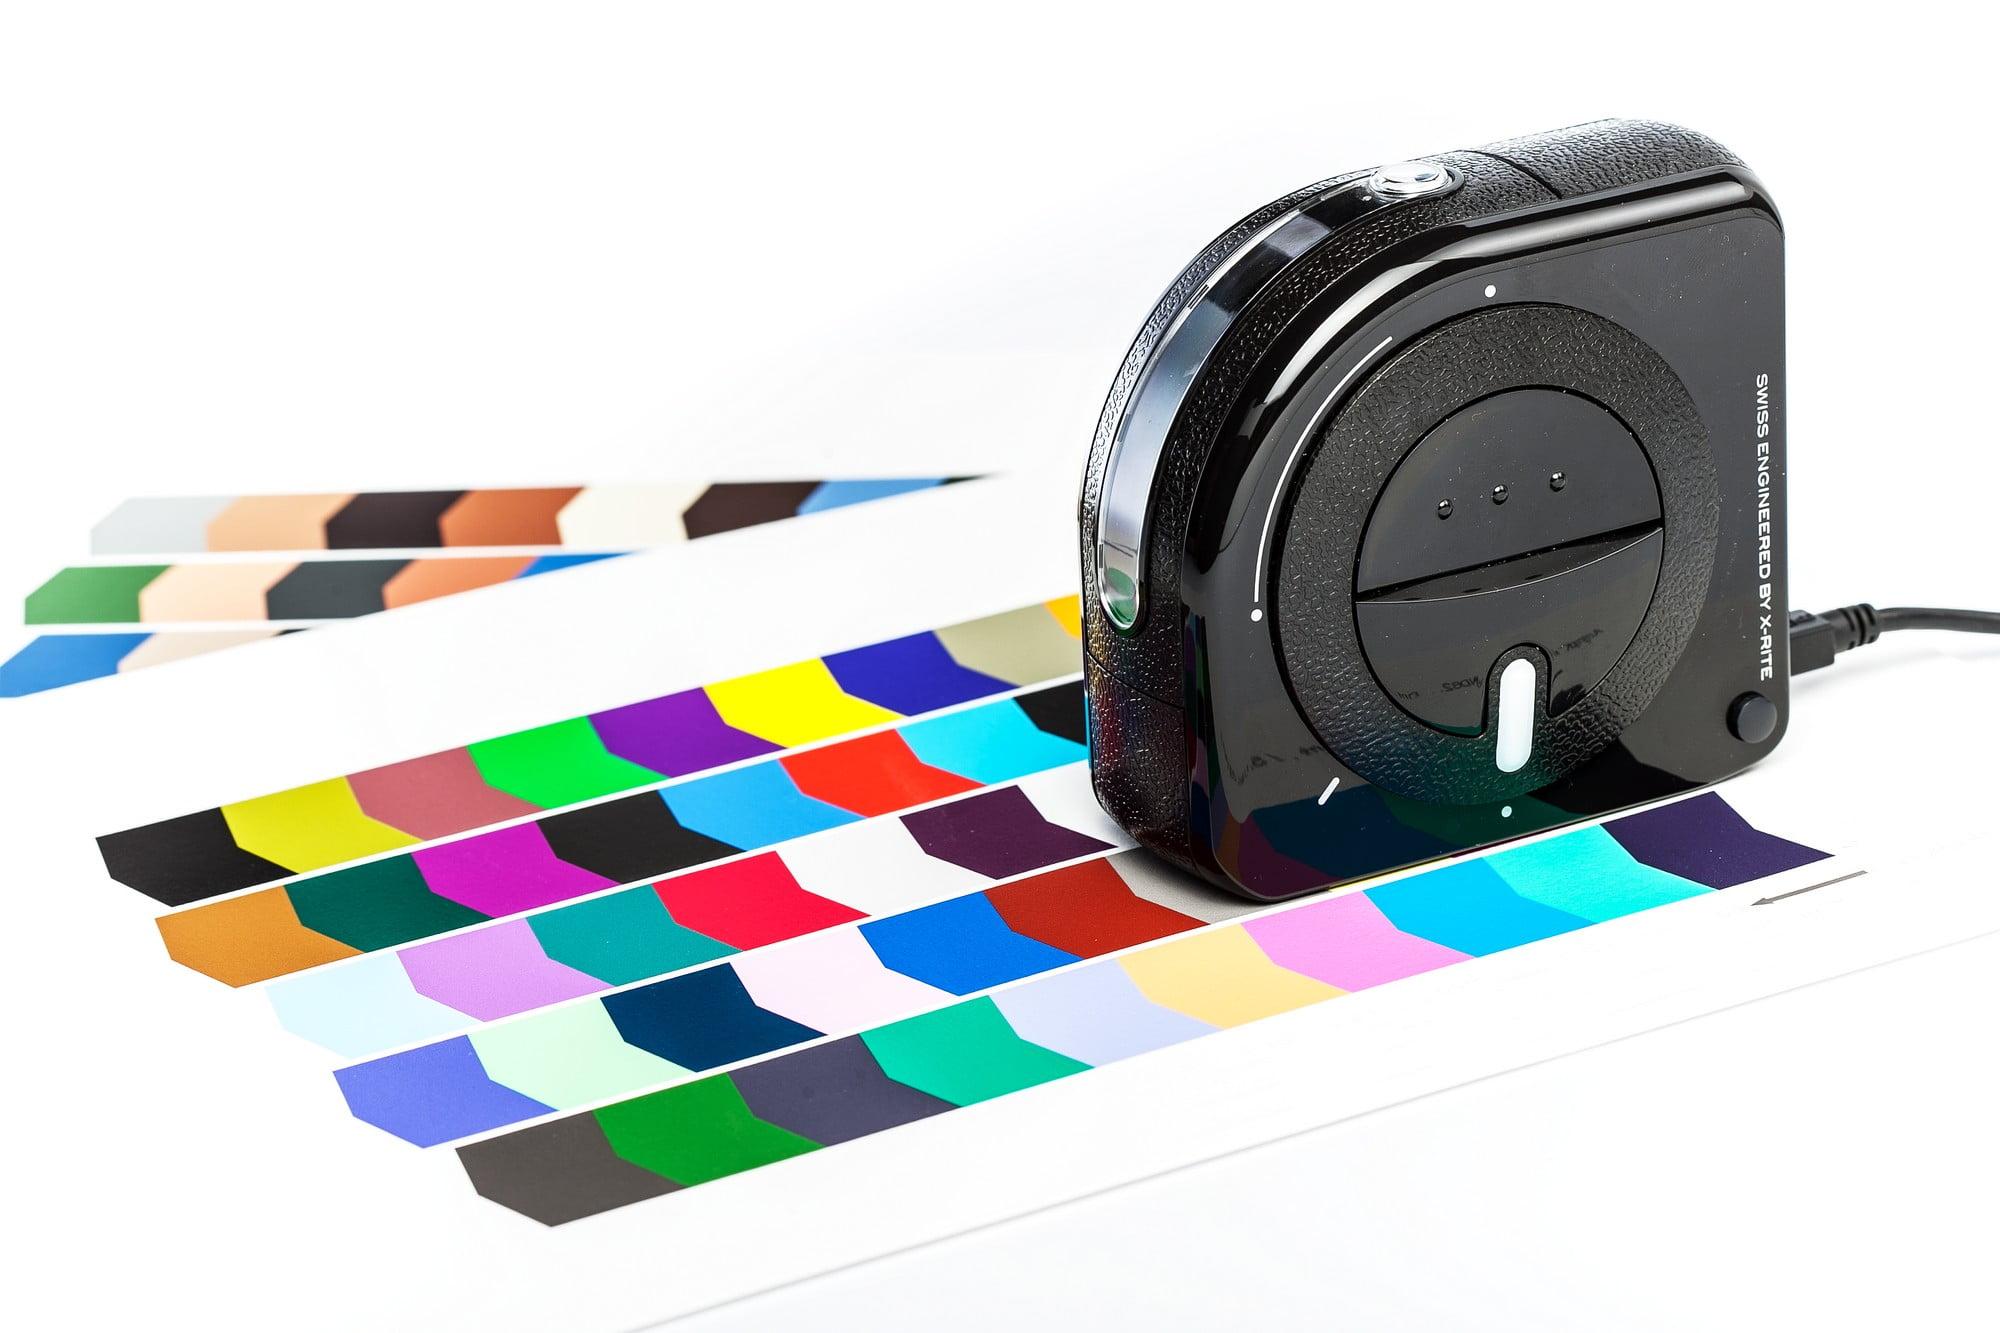 color management - profilowanie drukarek